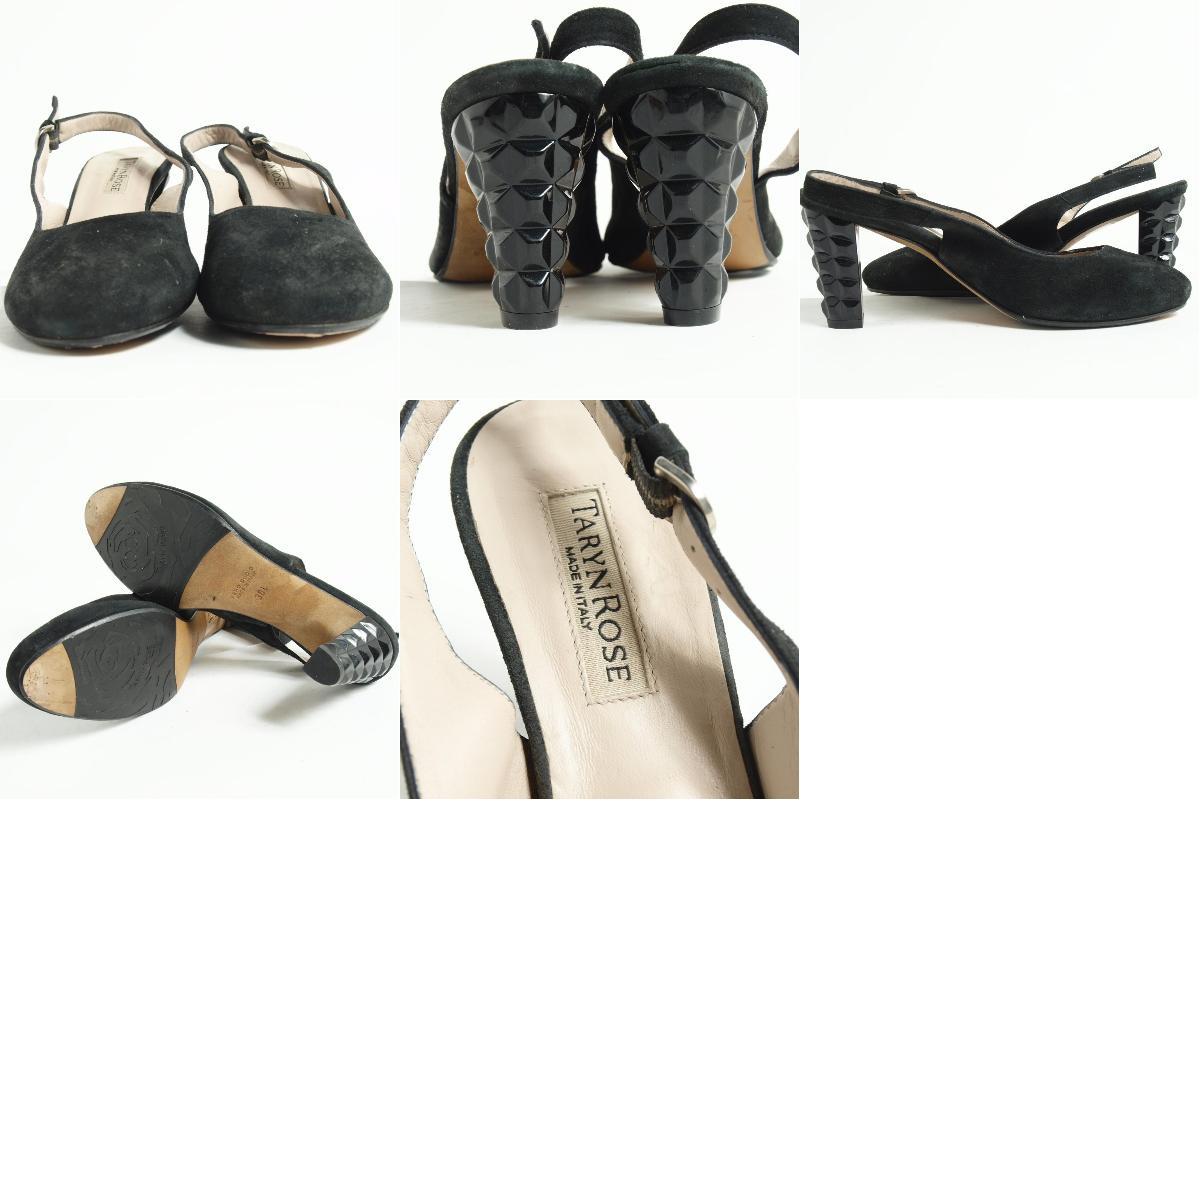 9e551df708c6 Vine Clothing Jam Sandals 36 5 Lady S 23 5cm Taryn Rose Bok9953